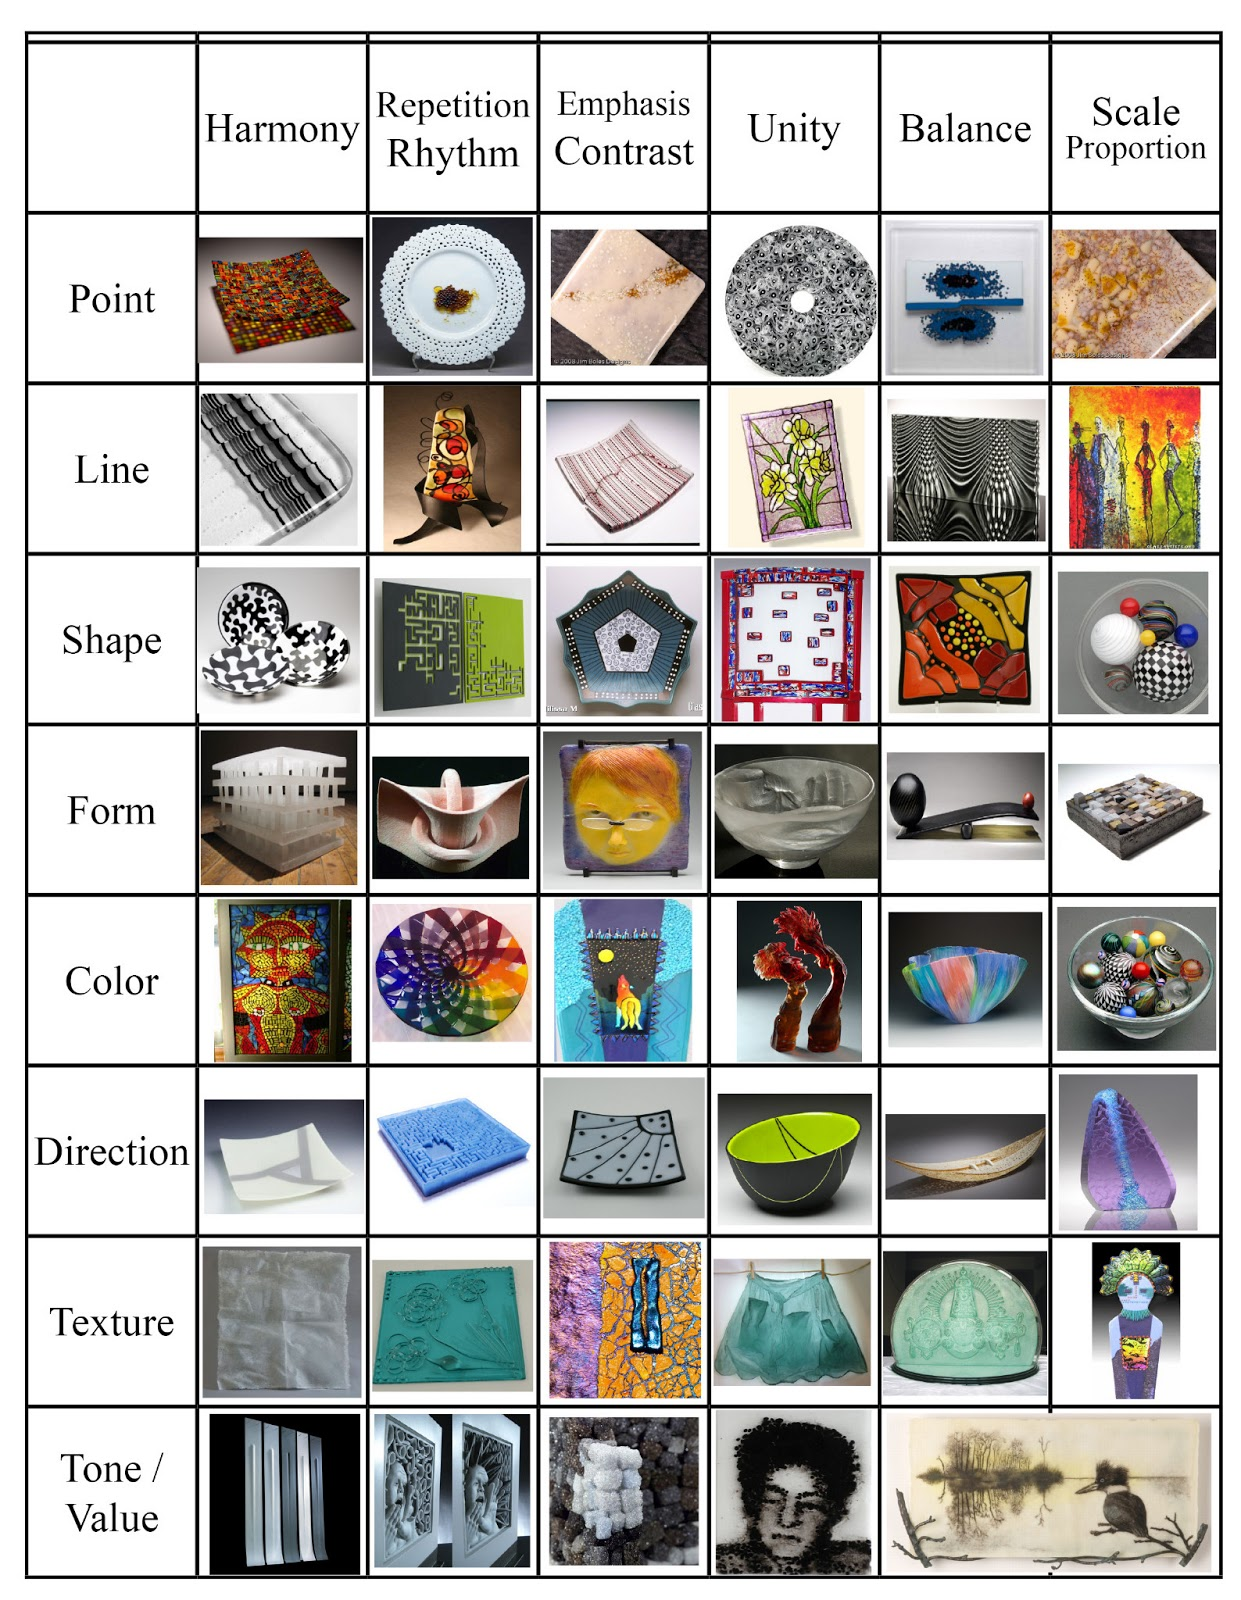 Jim Boles Designs Elements Amp Principles Of Design In